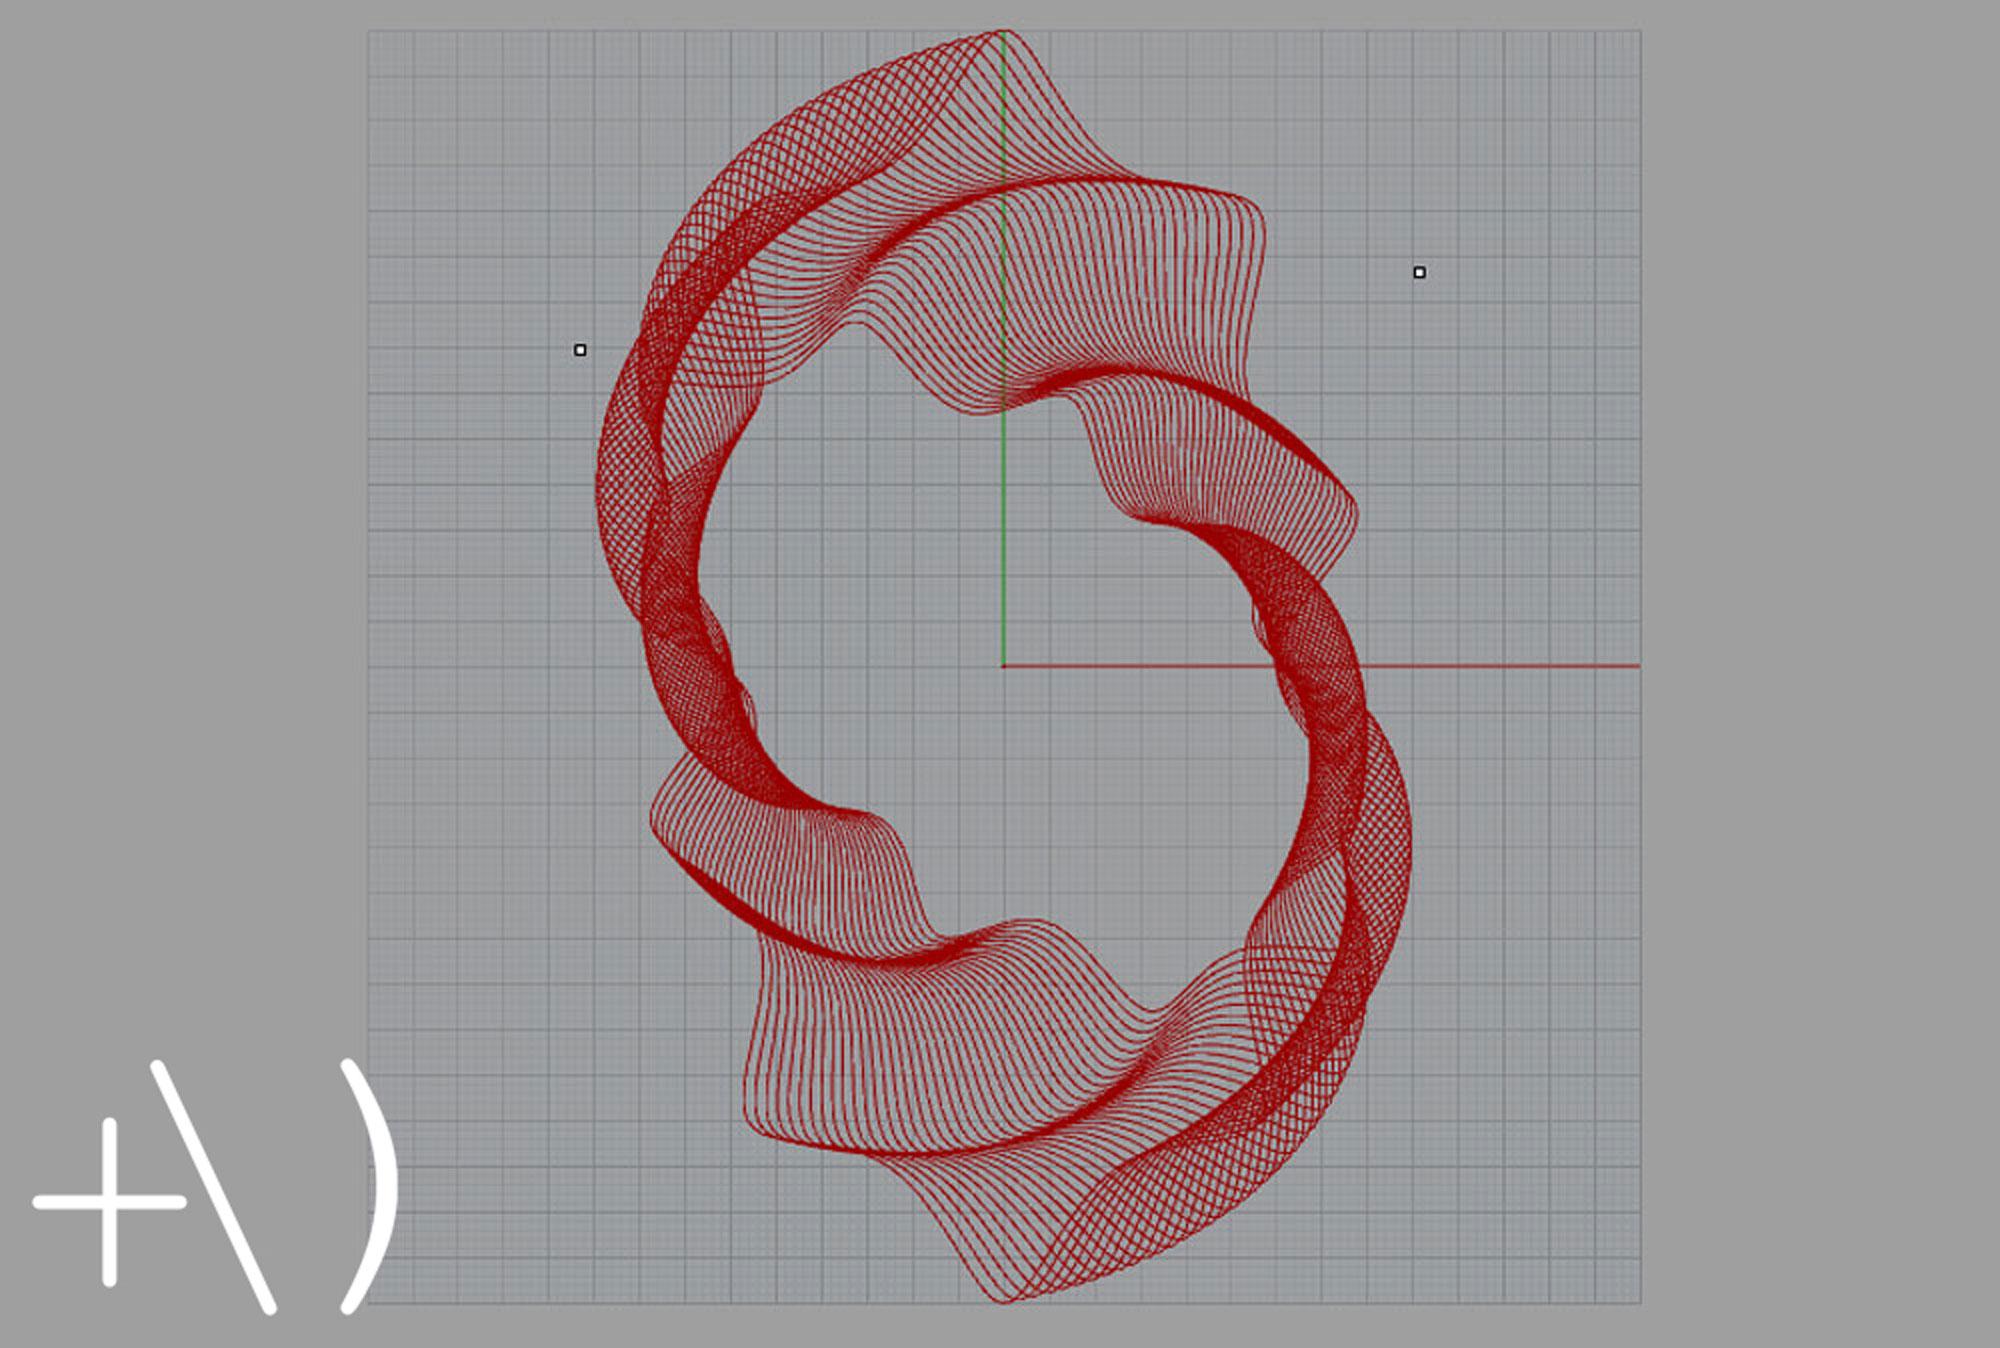 computational clay design torsione wireframe